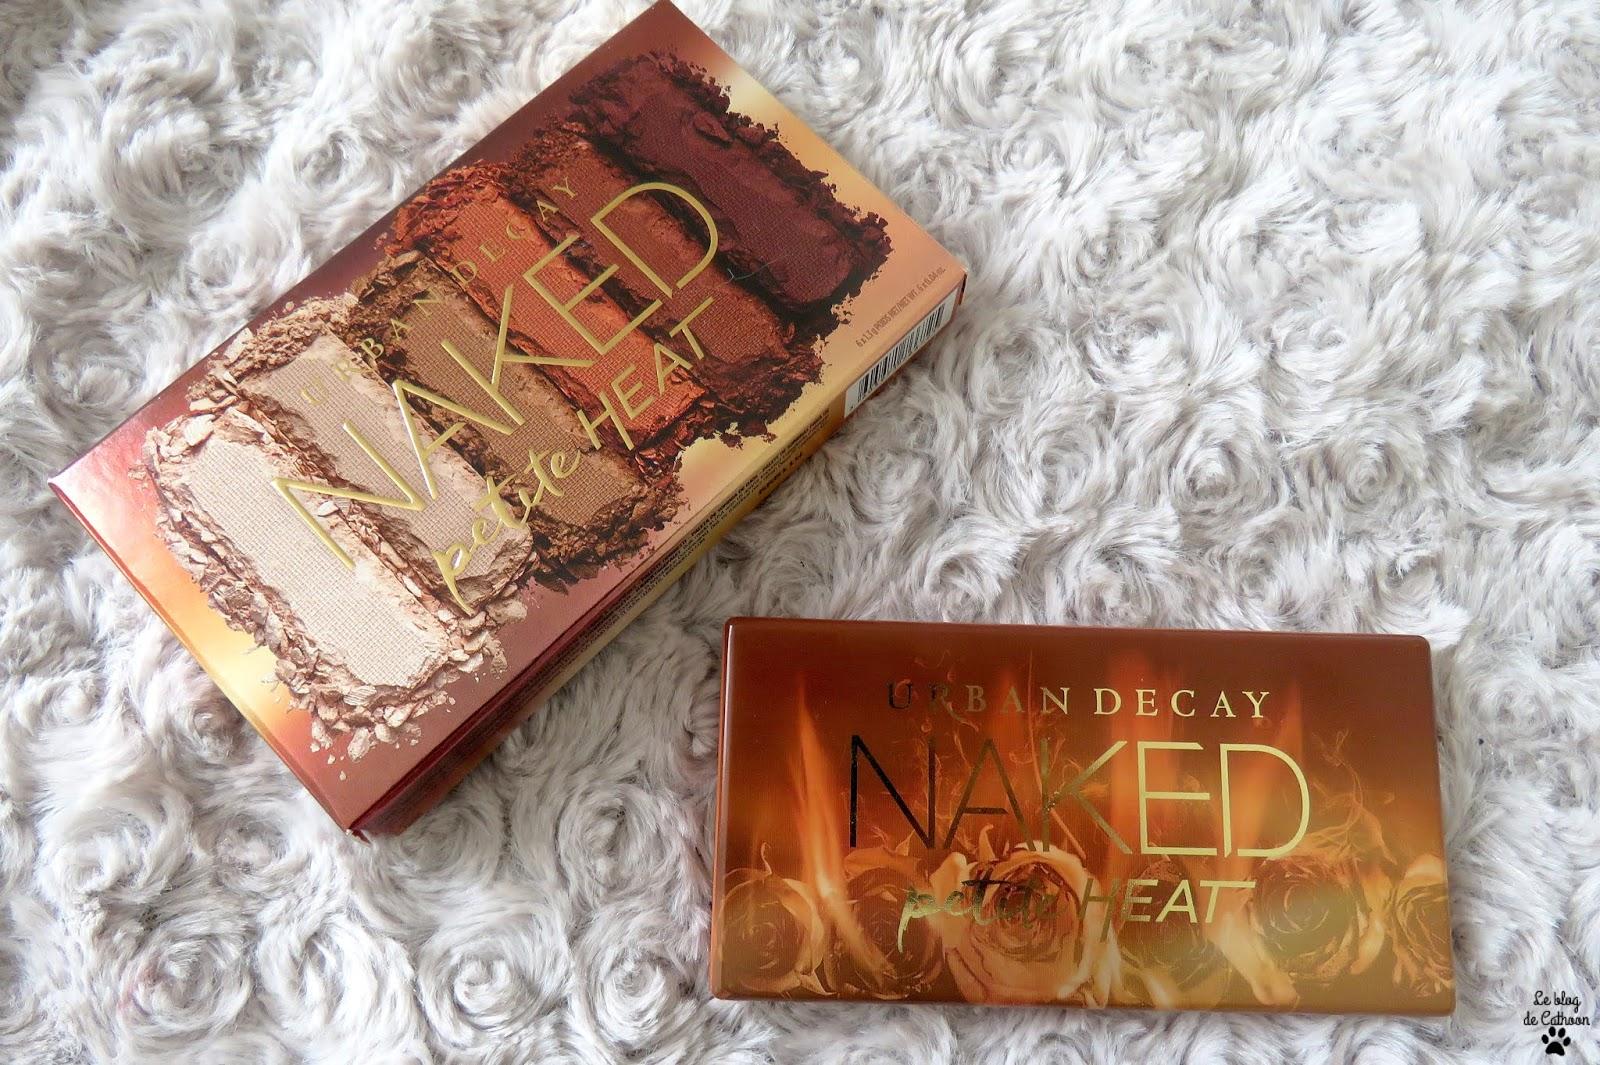 Naked Petite Heat - Urban Decay